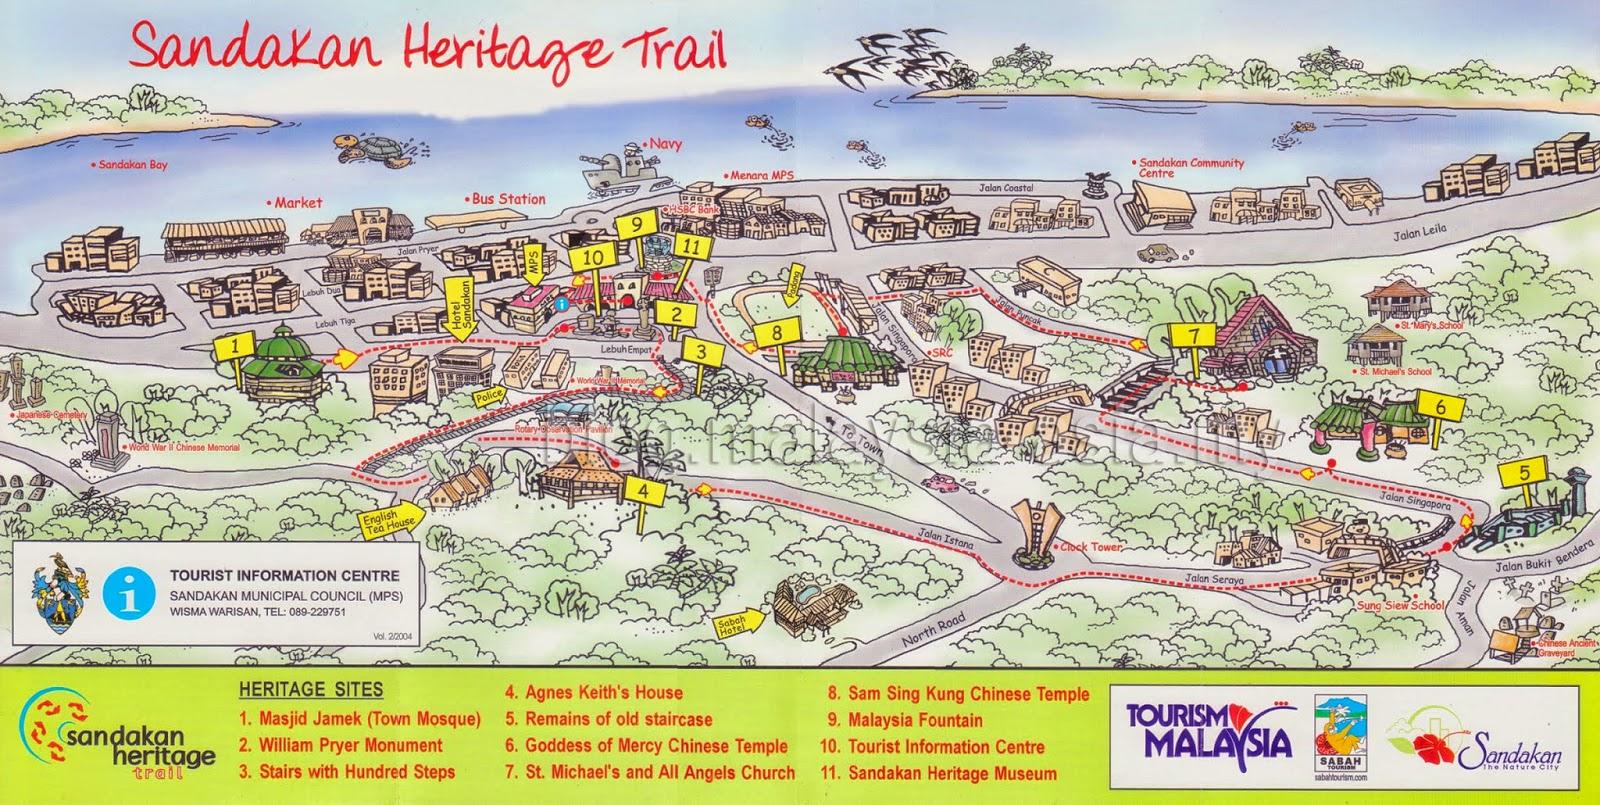 Sandakan Heritage Trail Map